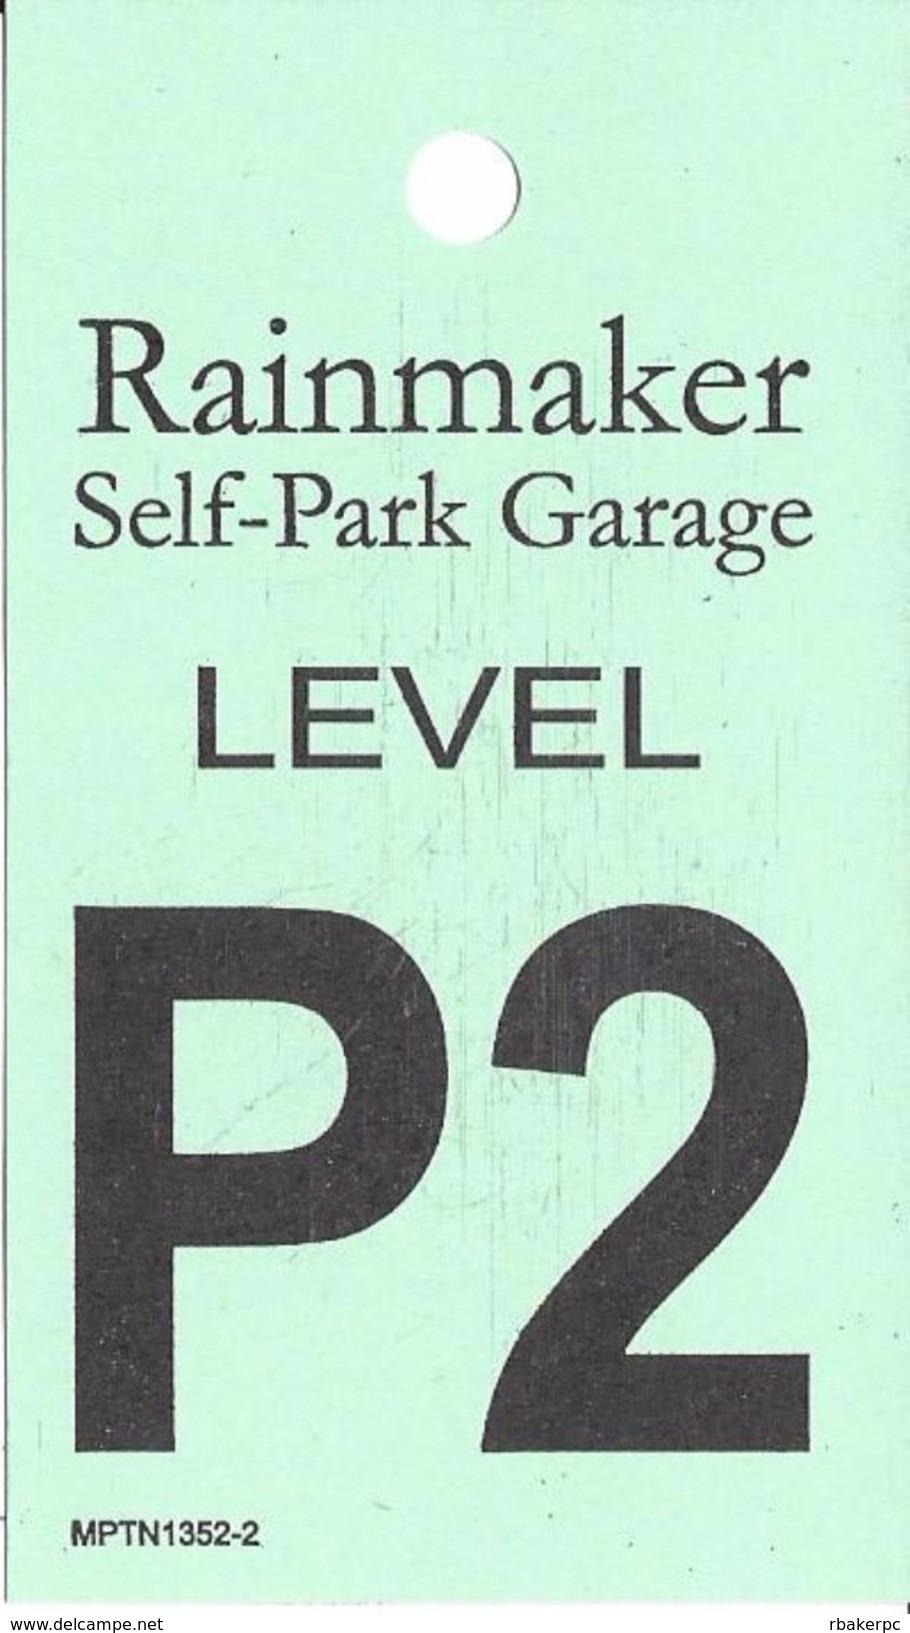 Foxwoods Casino - Ledyard, CT - Rainmaker Self-Park Garage Level P2 - Paper Reminder Card - Casino Cards